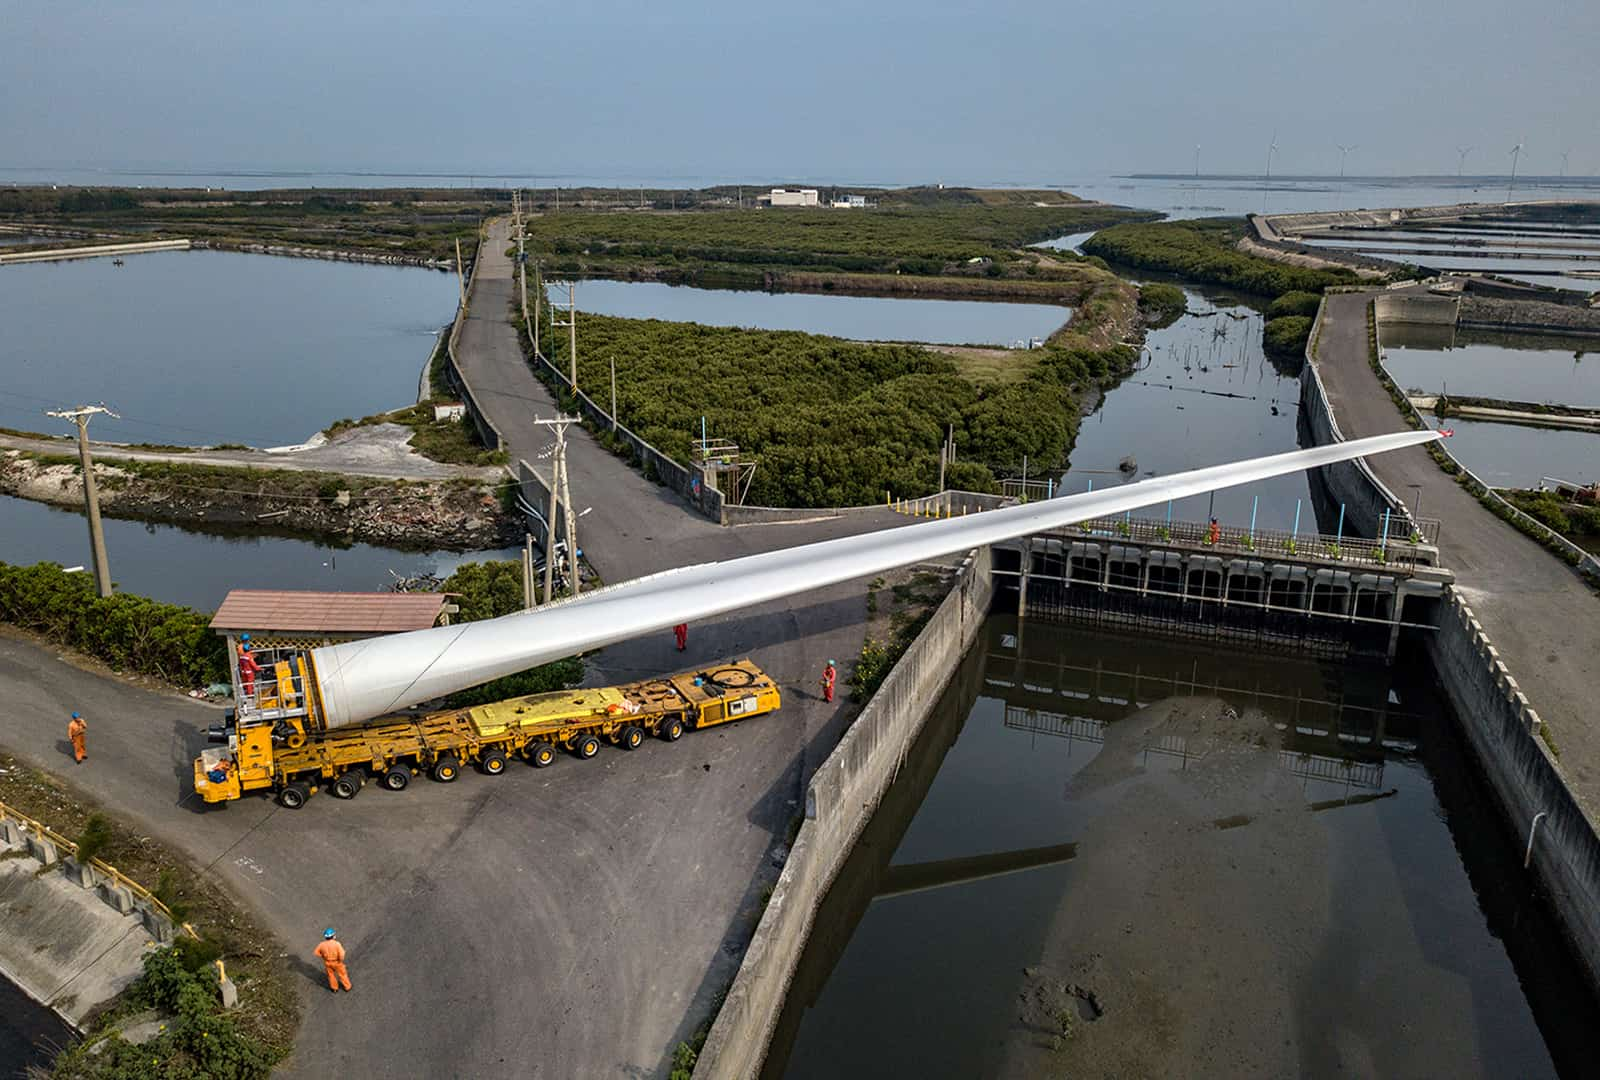 Hanbao Wind Turbine transport and lifting